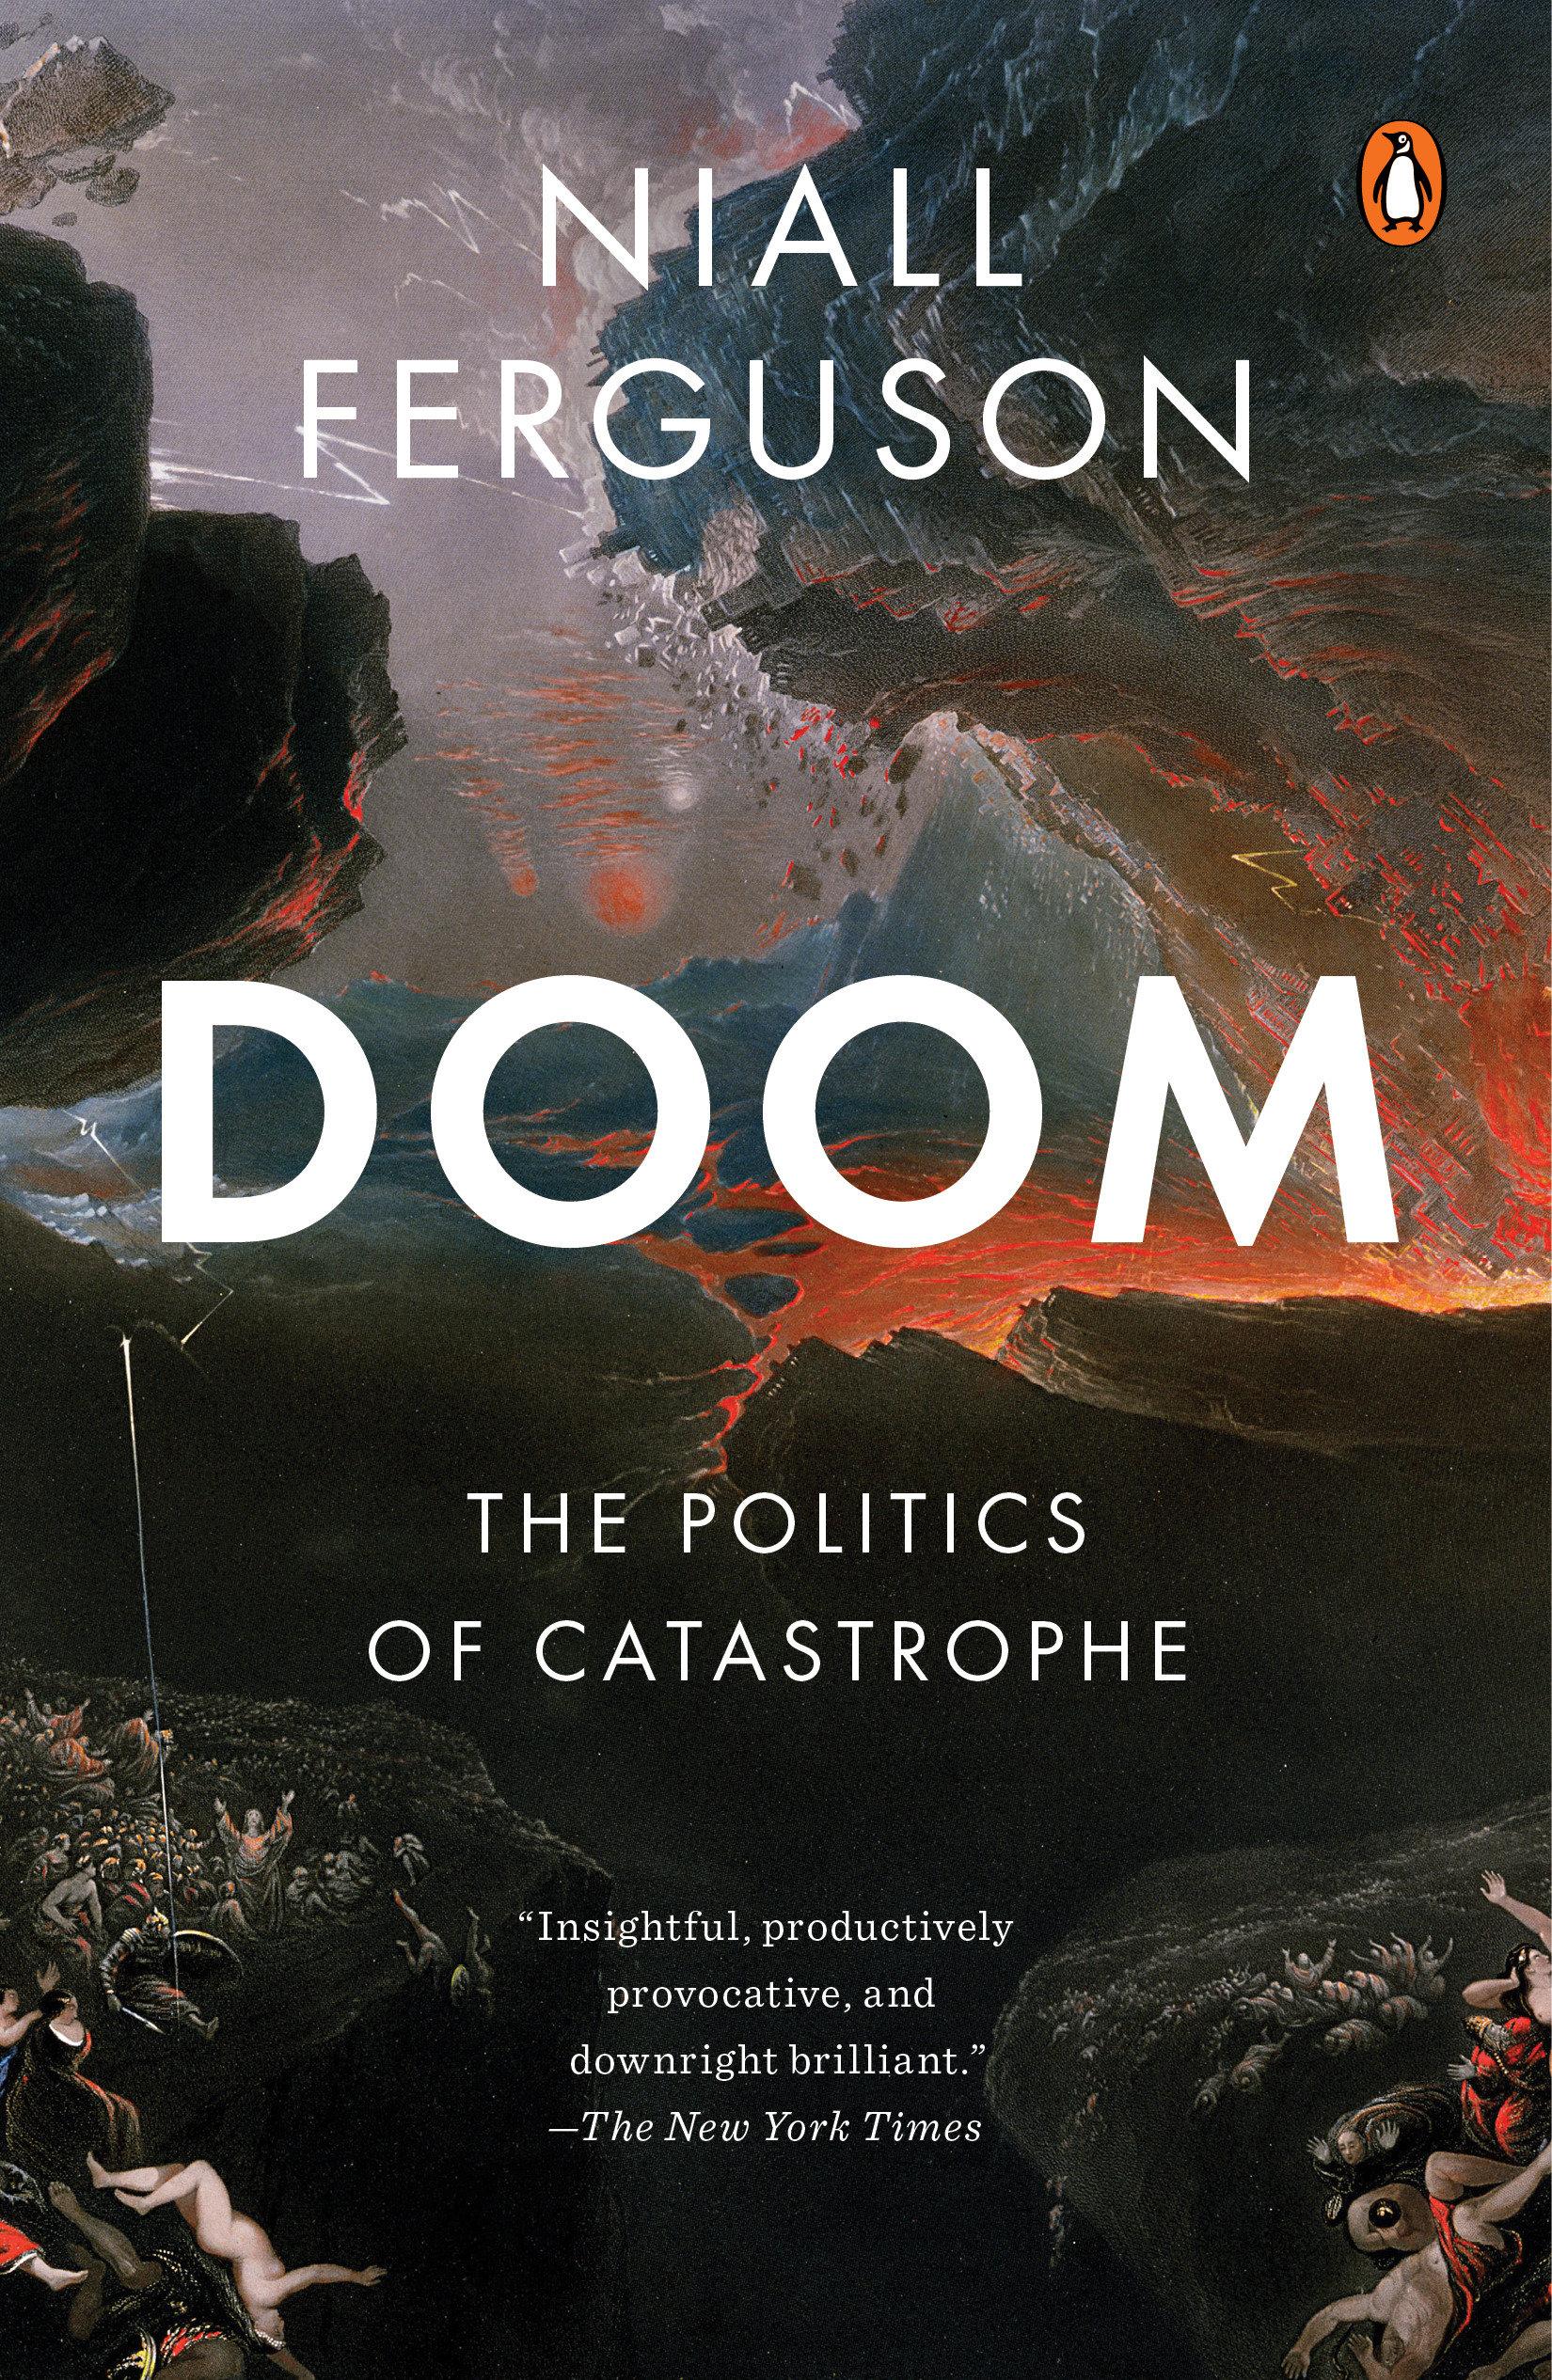 Doom The Politics of Catastrophe